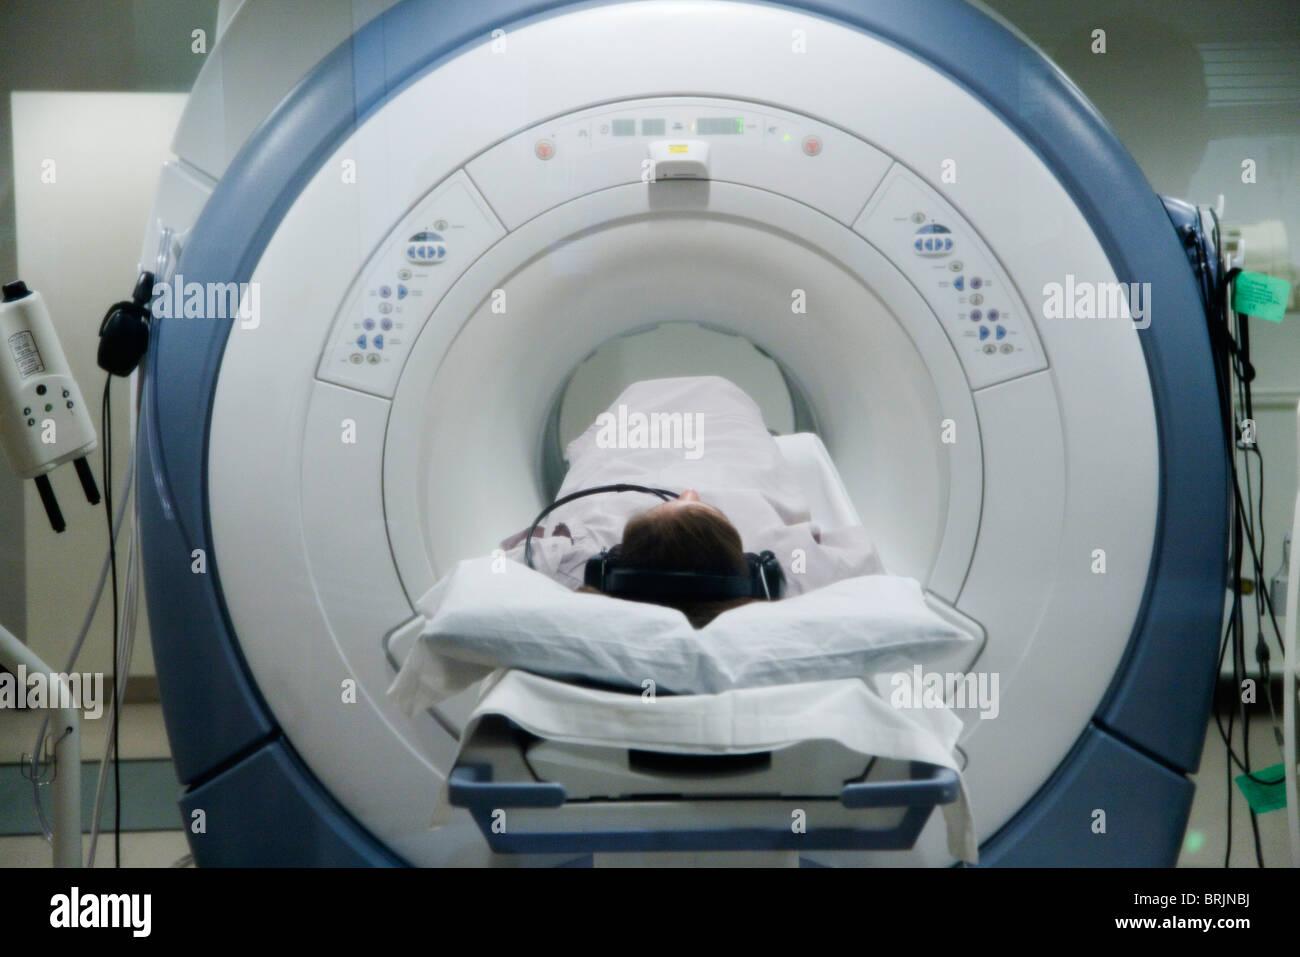 Patient undergoing MRI scan - Stock Image